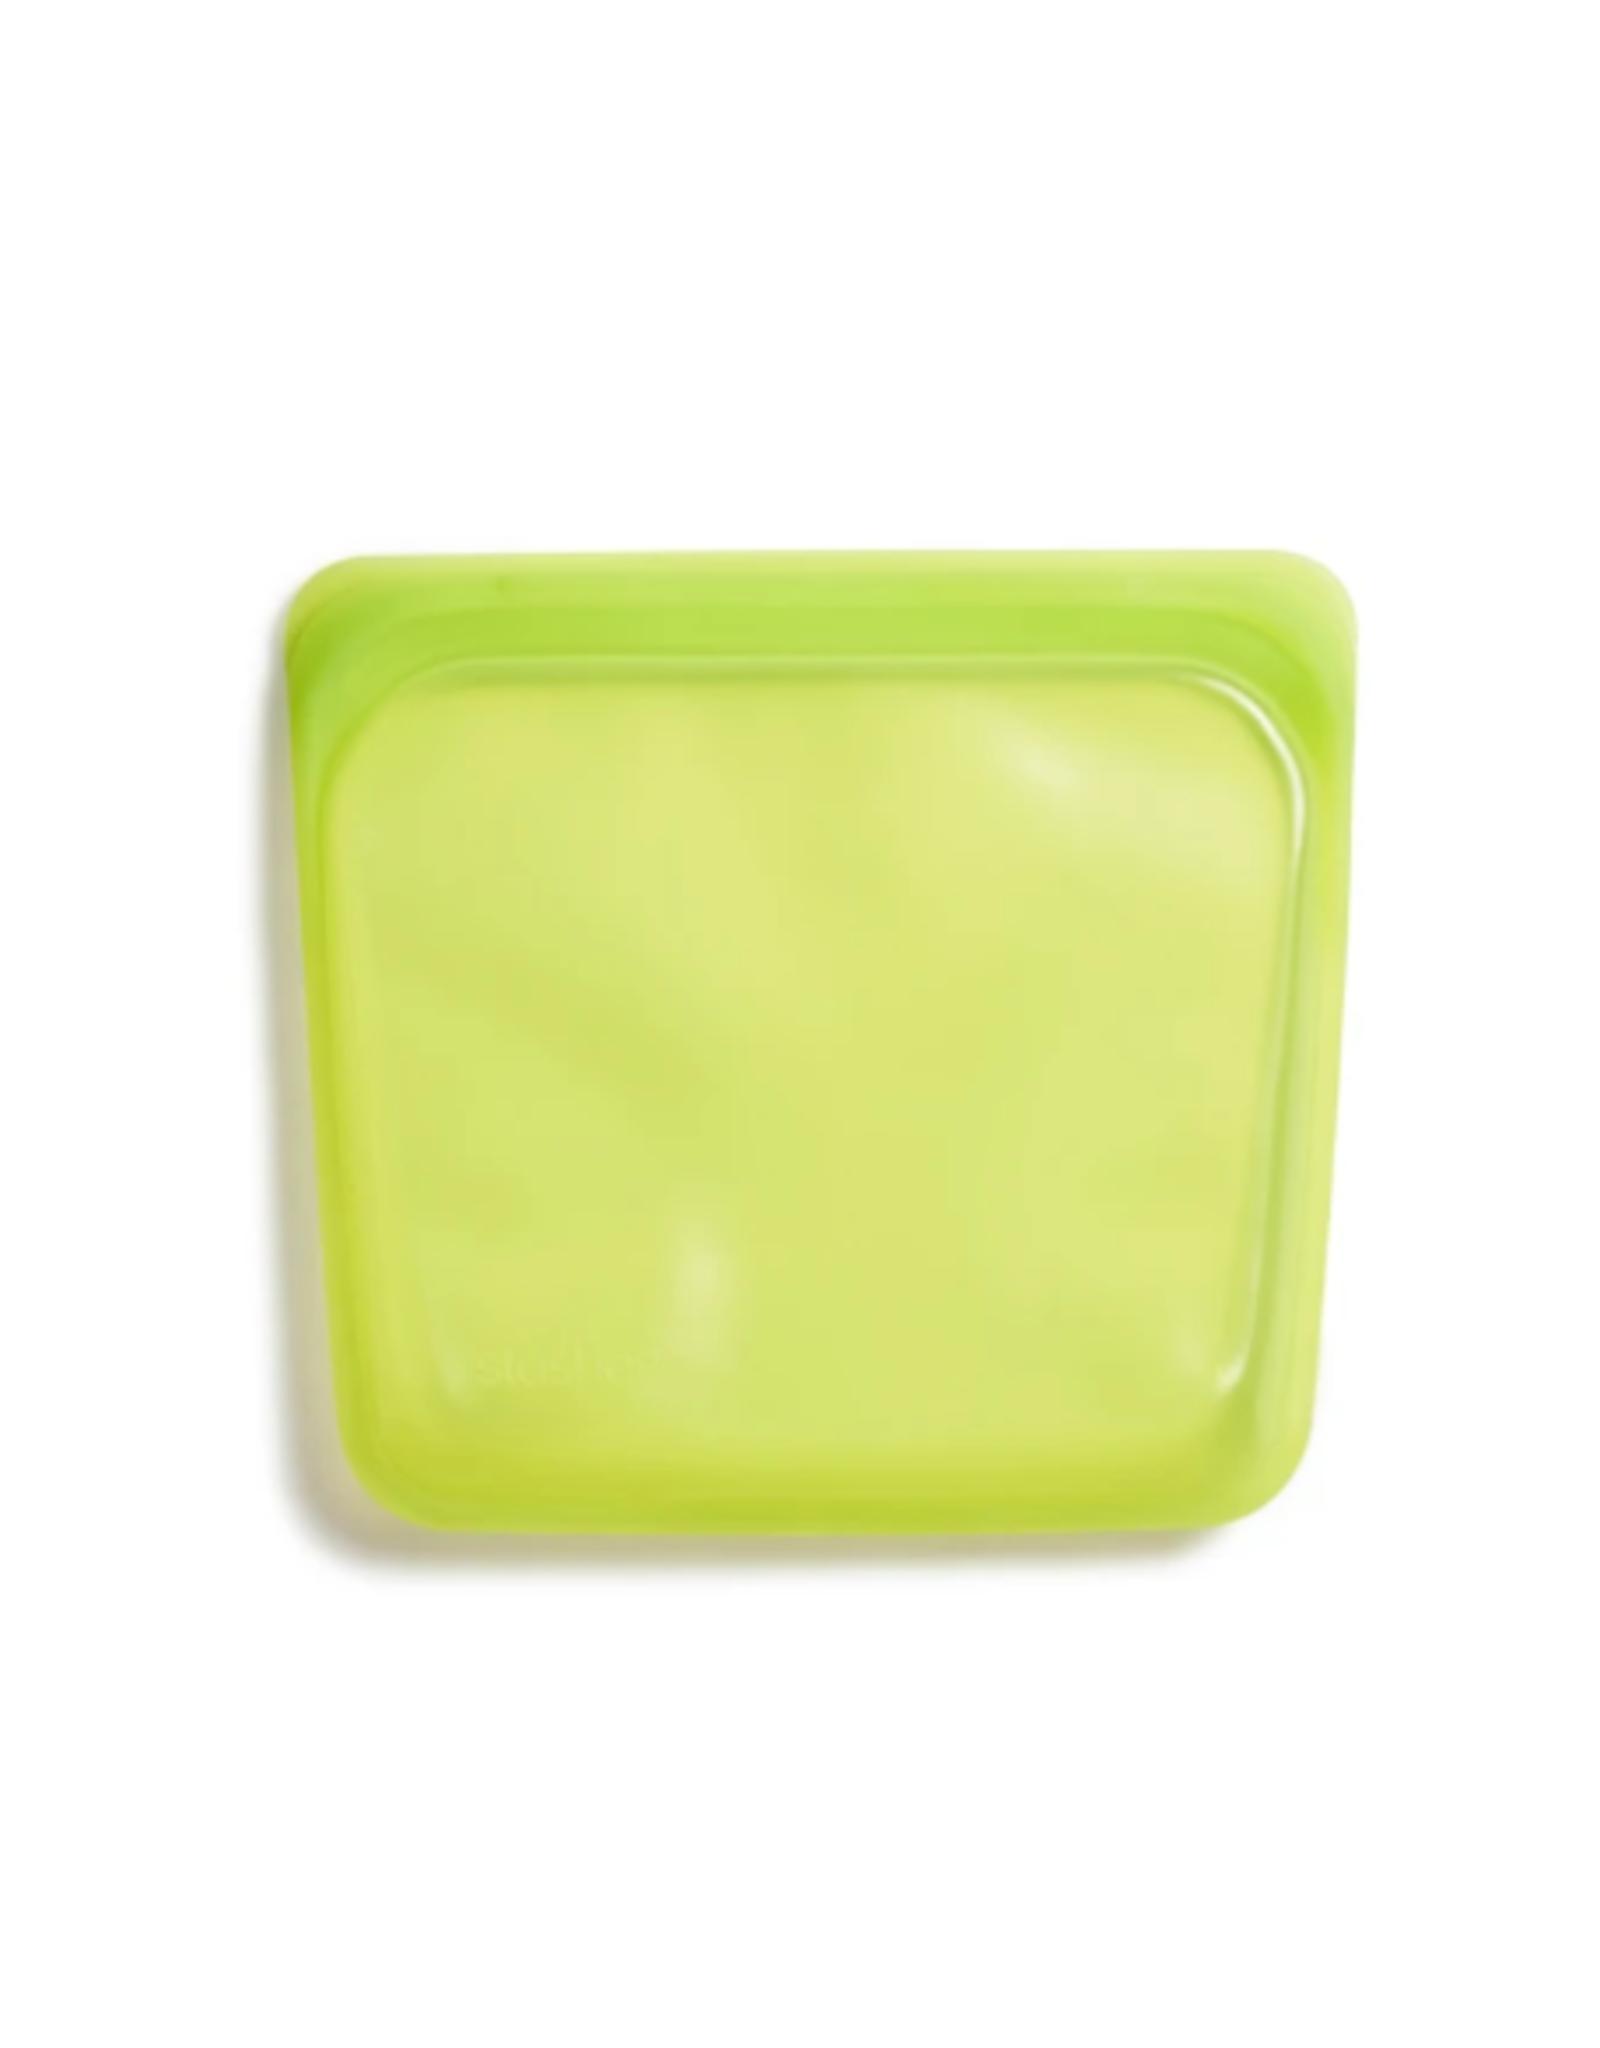 Stasher Stasher Sandwich, Lime